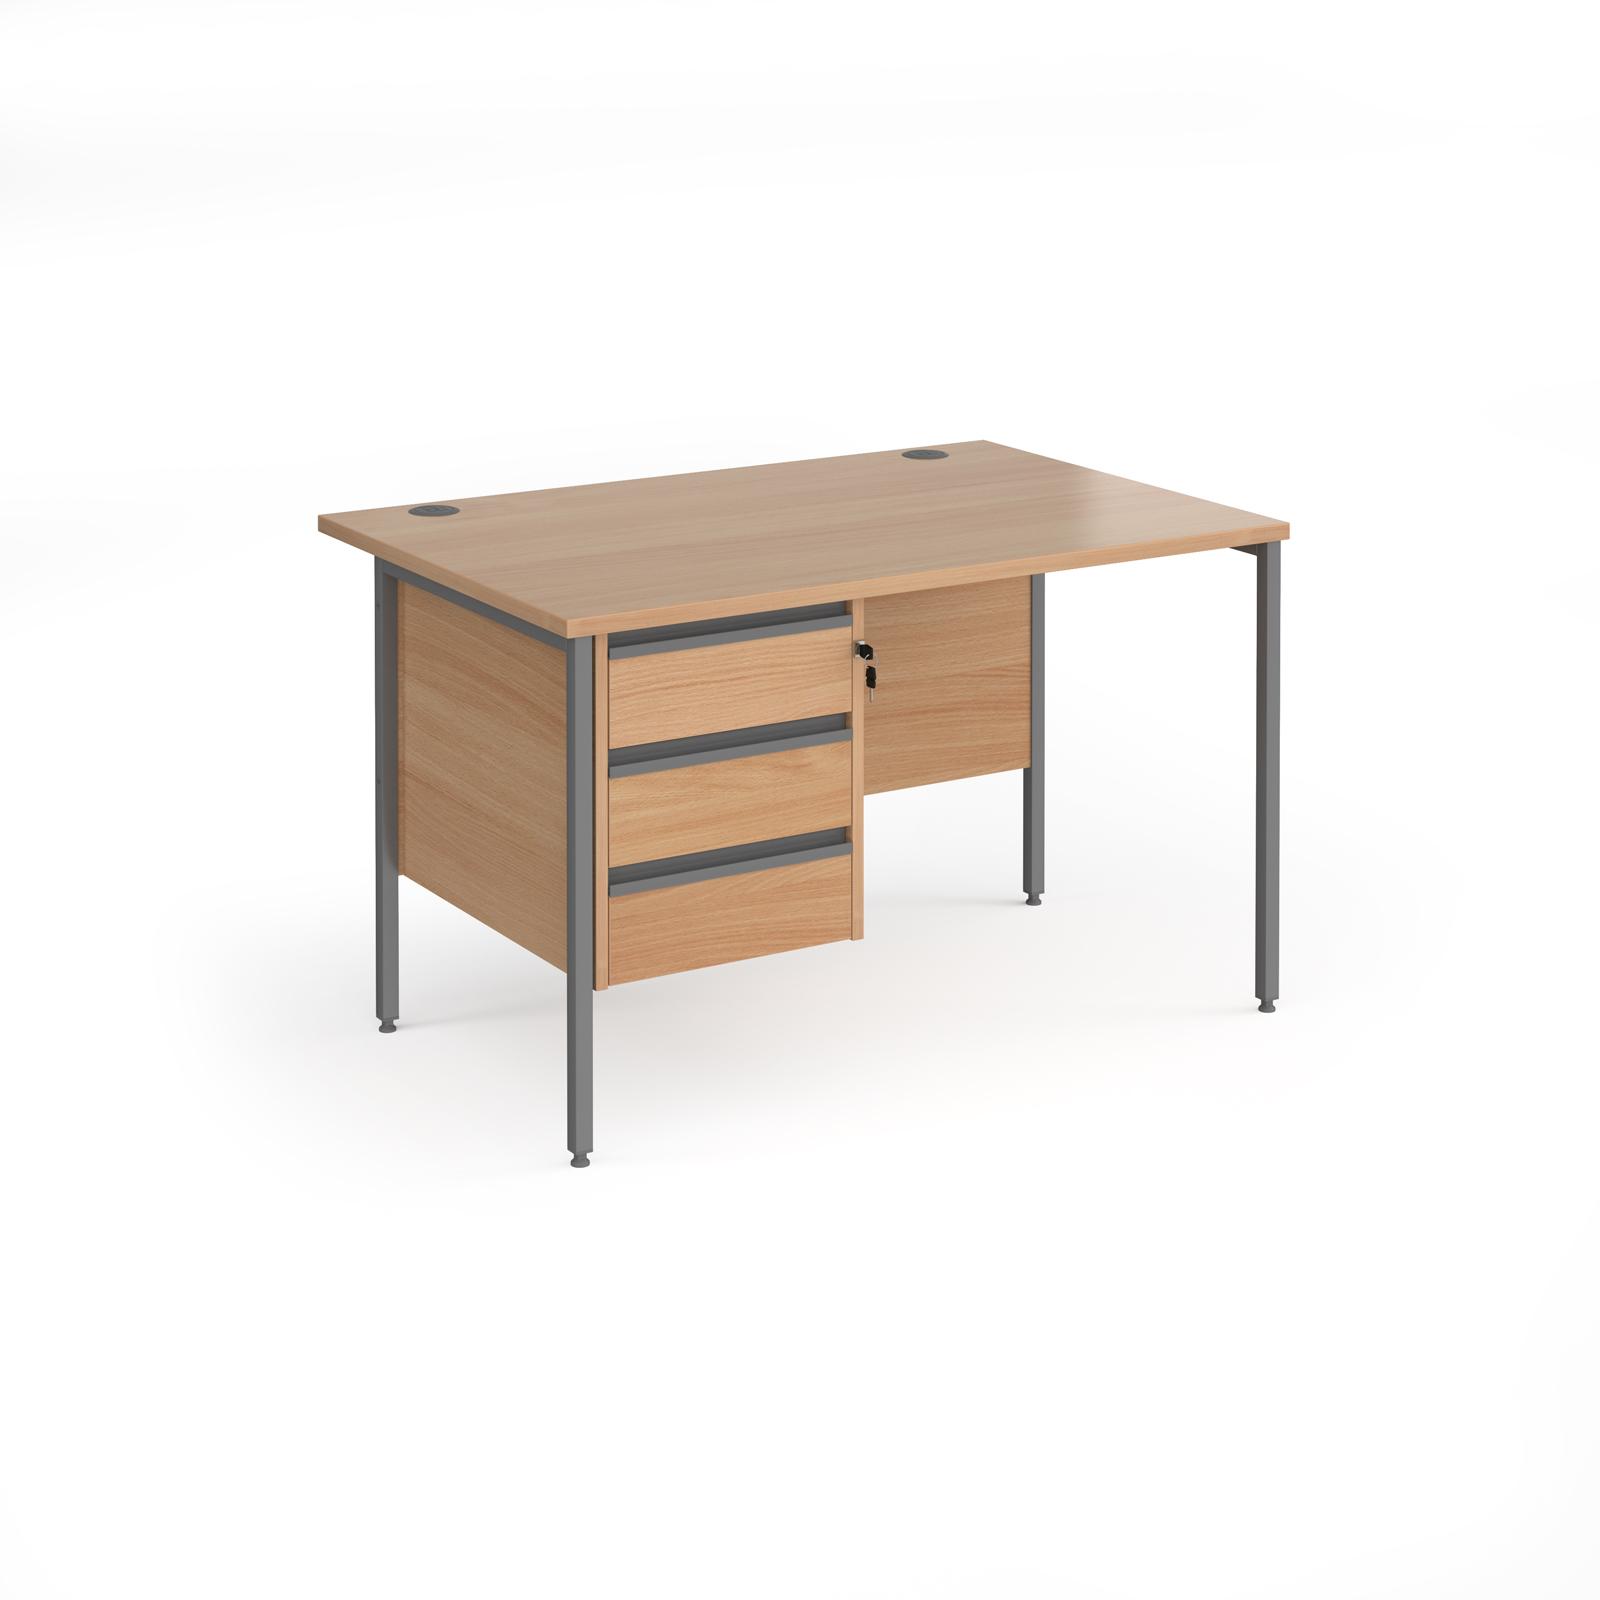 Rectangular Desks Contract 25 H-Frame straight desk with 3 drawer pedestal